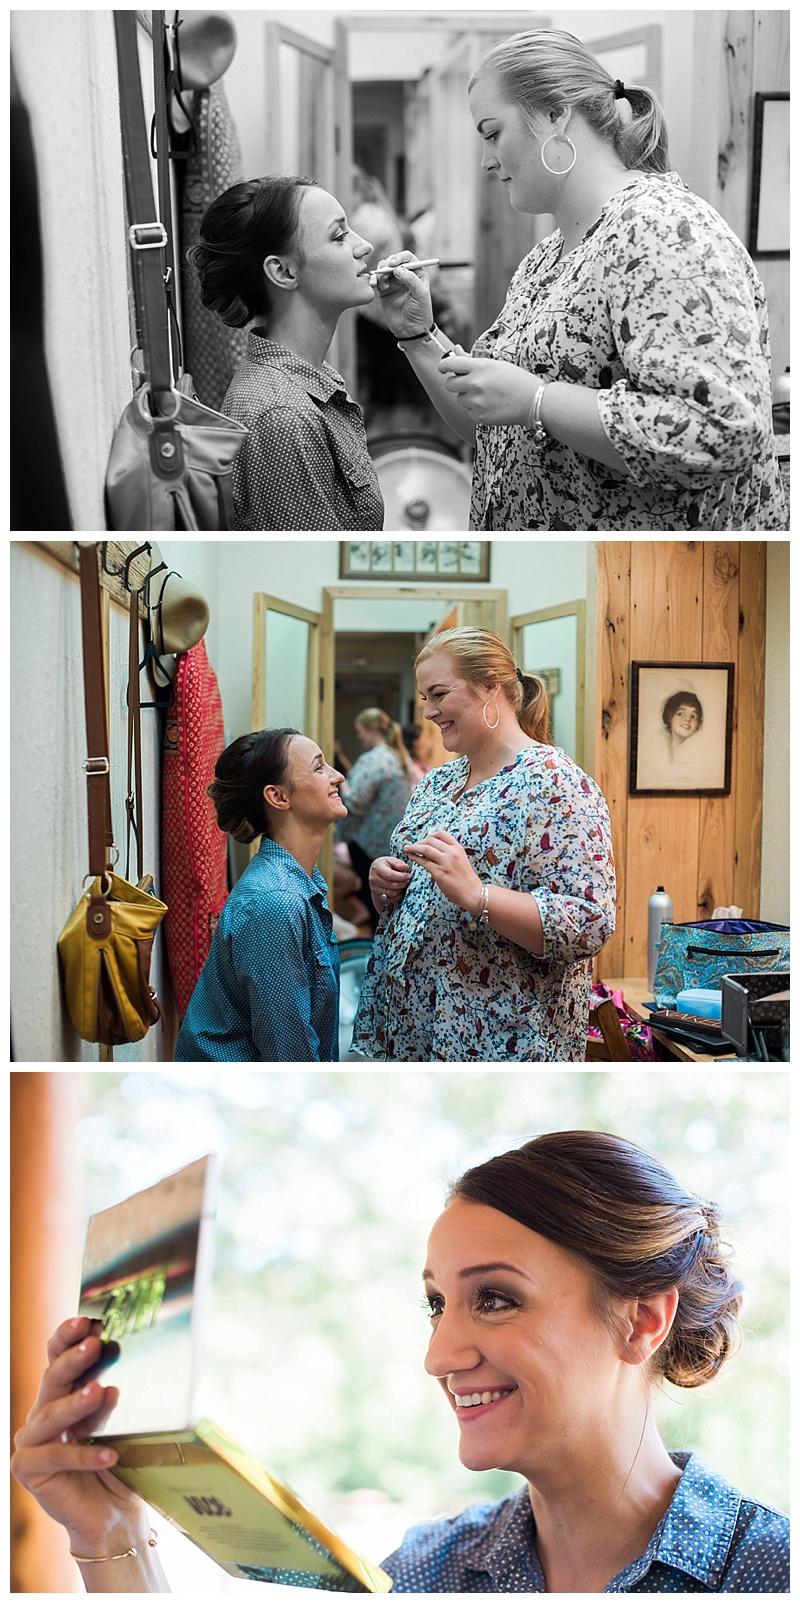 Evan's cousin Anna did an amazing job on Mackenzie's make-up!